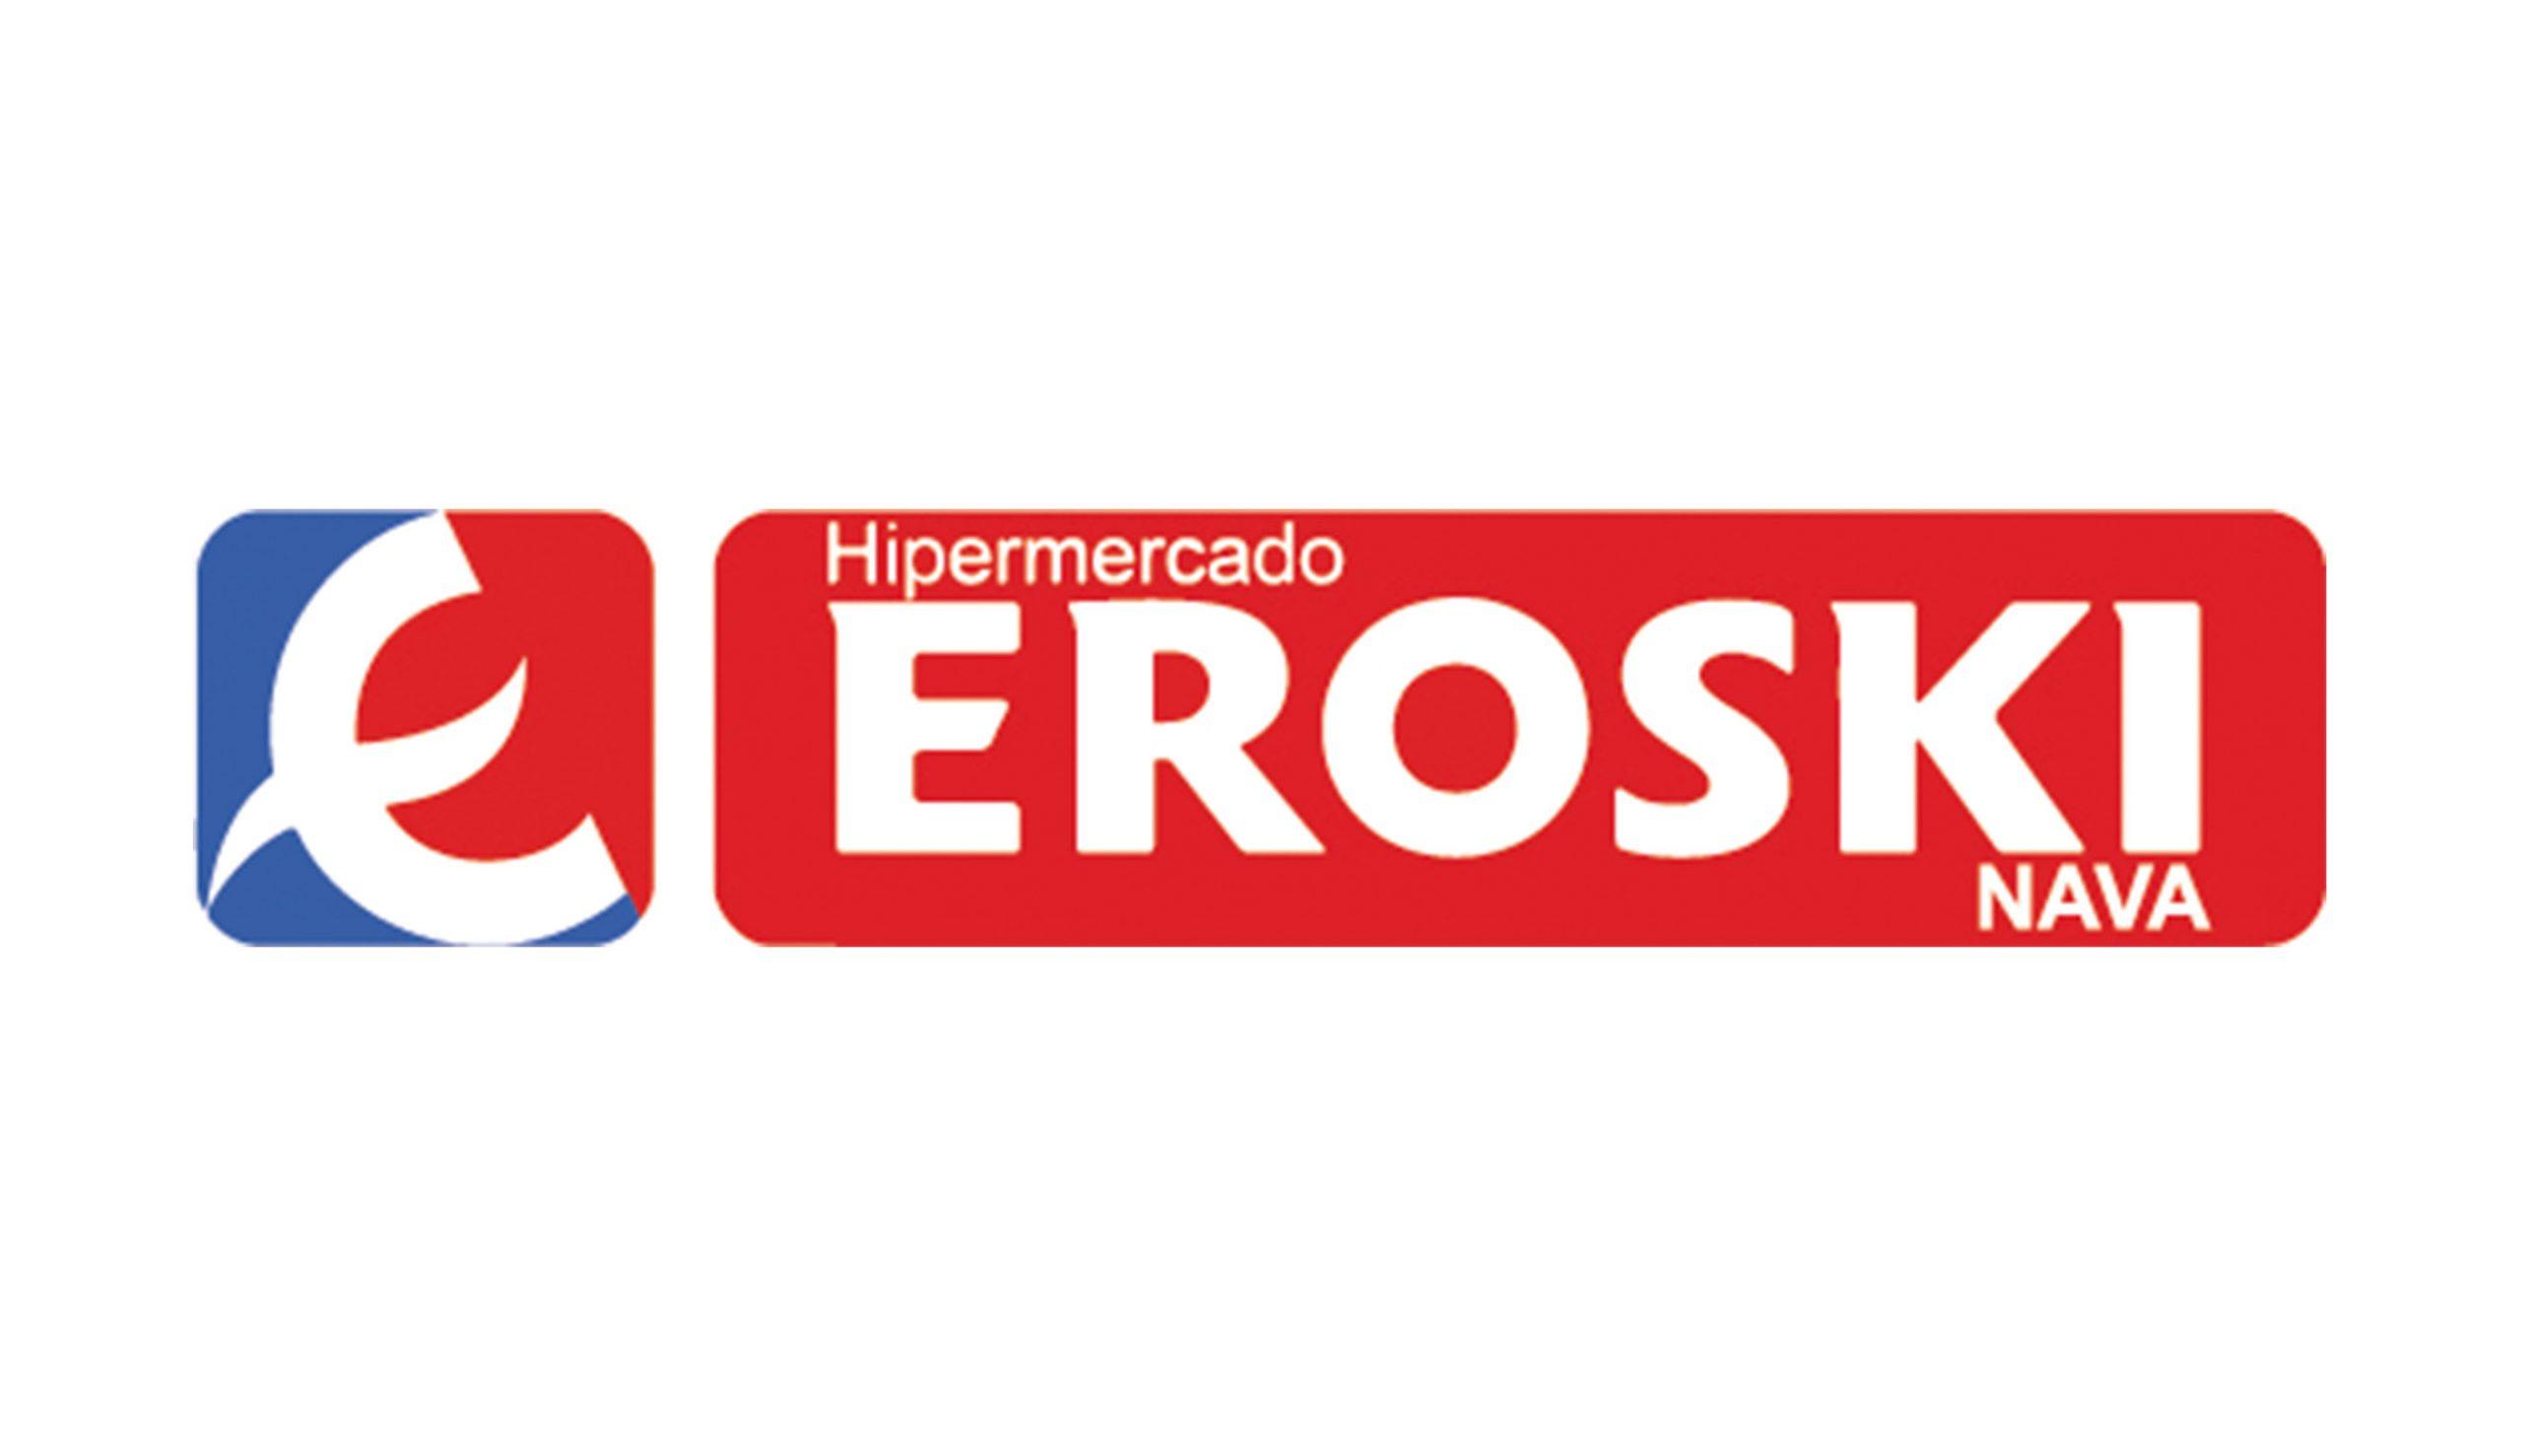 eroskiweb